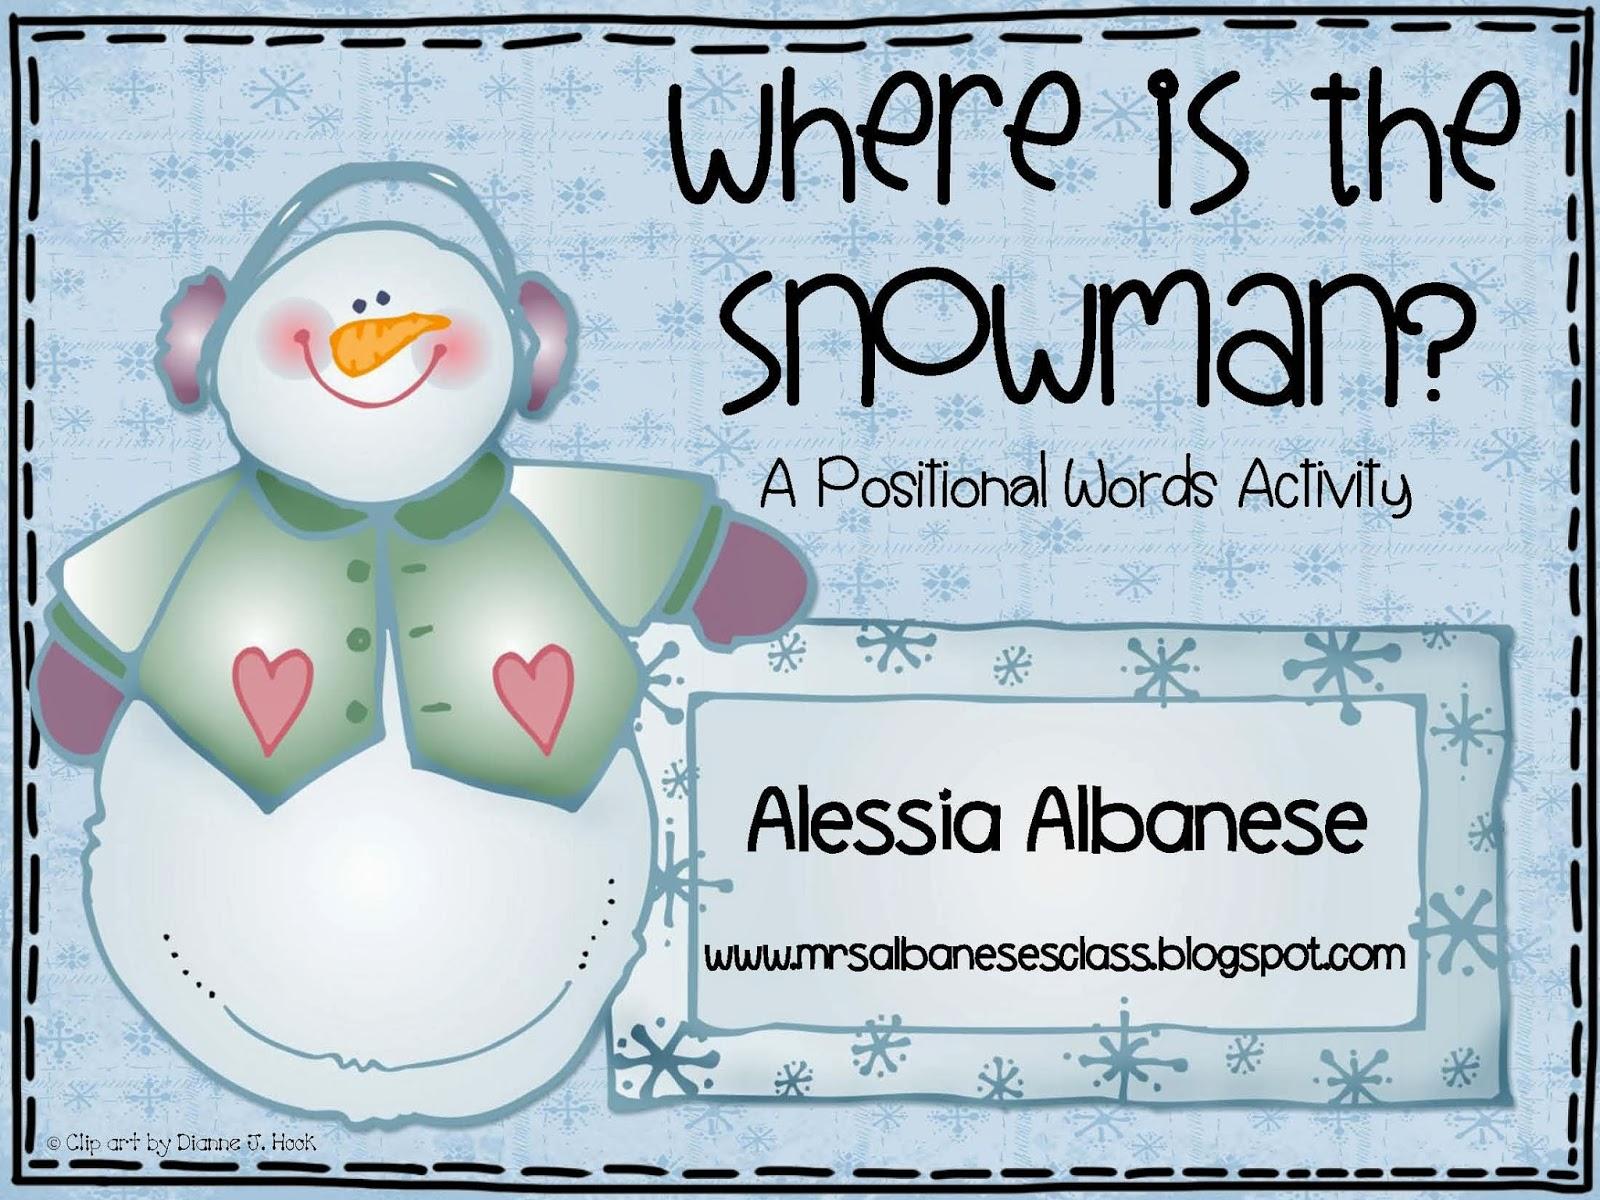 http://www.mrsalbanesesclass.blogspot.ca/2014/02/where-is-snowman-freebie.html